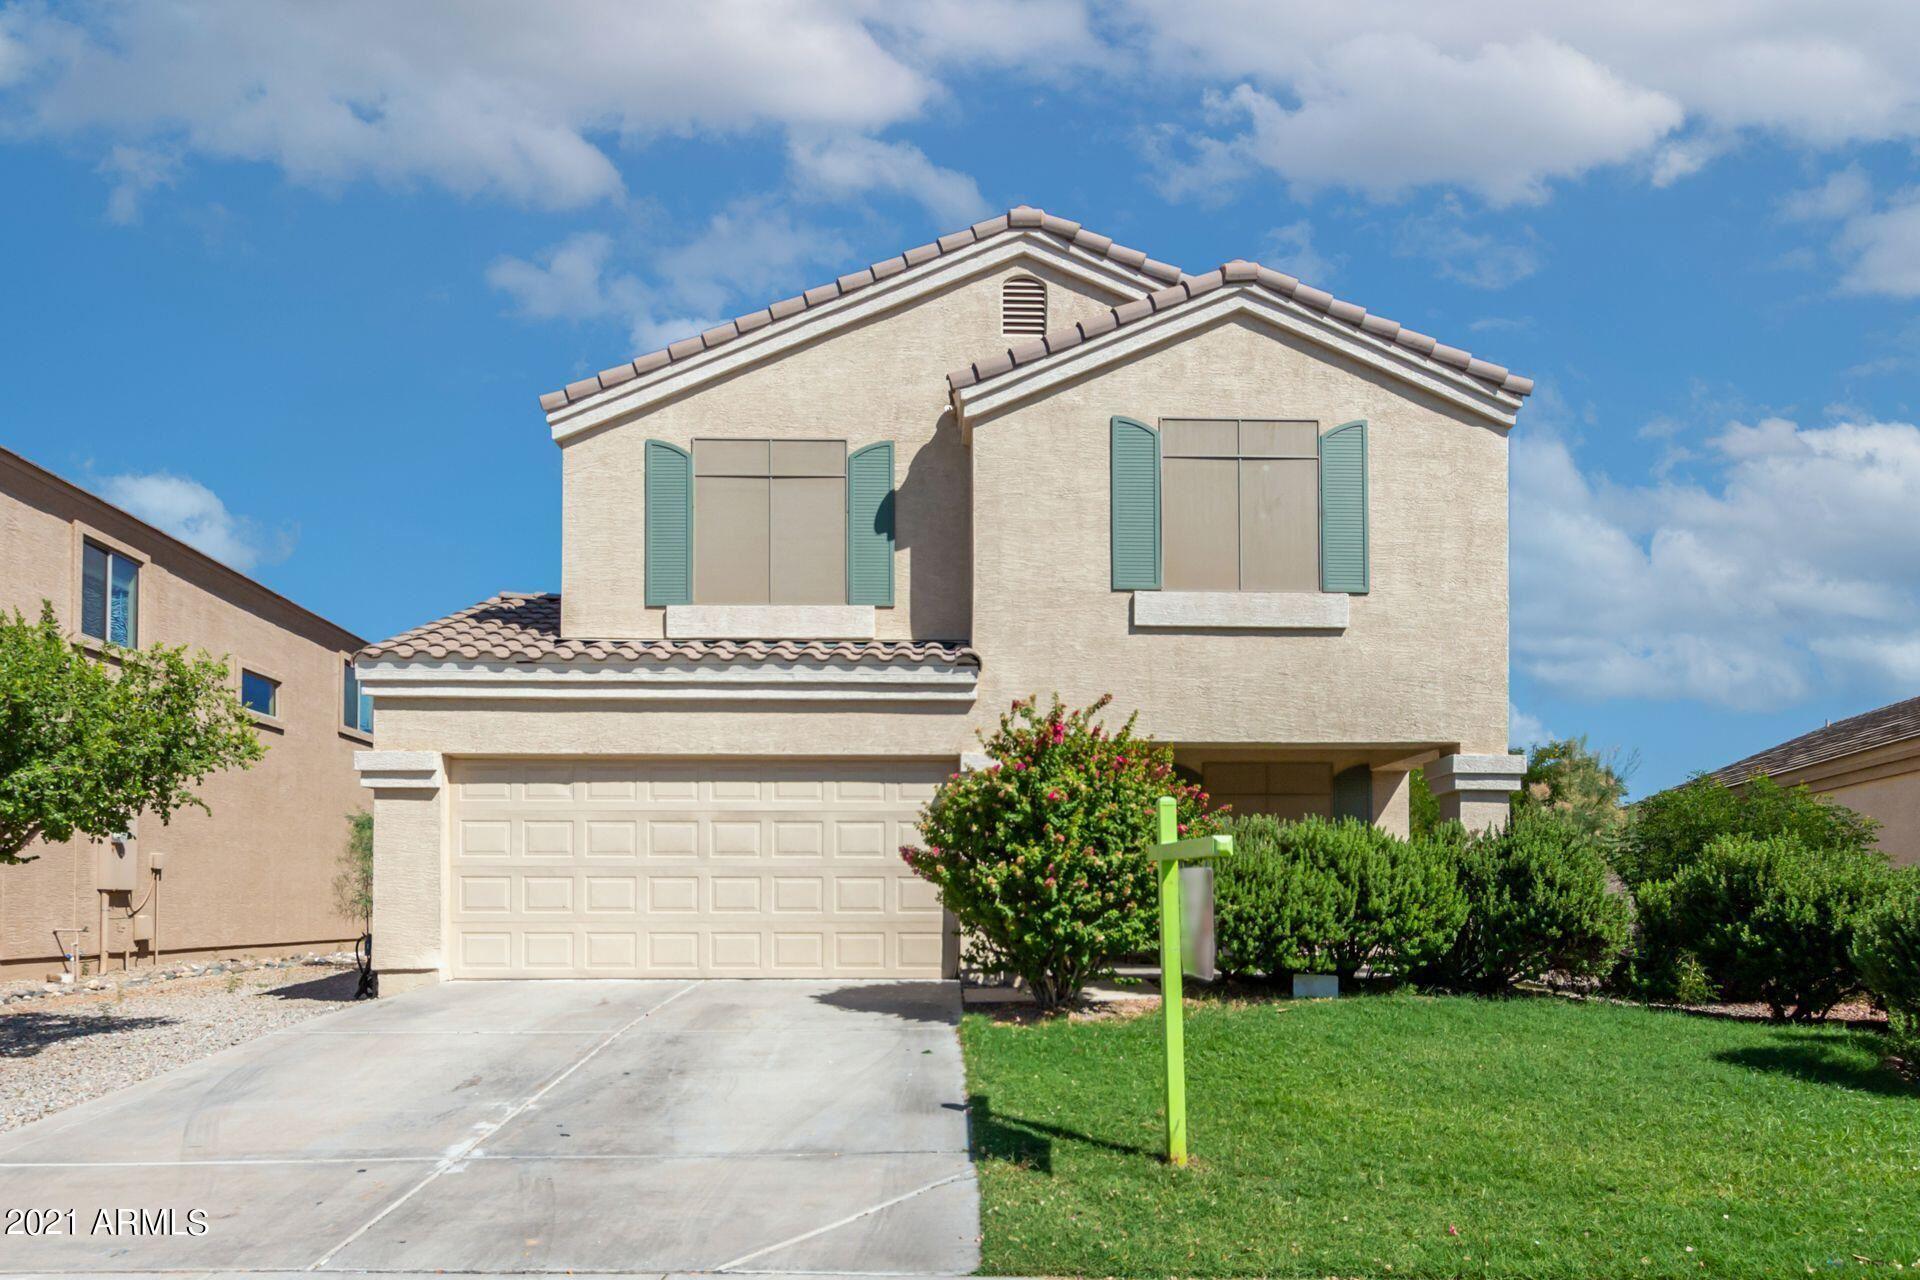 10612 W SONORA Street, Tolleson, AZ 85353 - MLS#: 6298285